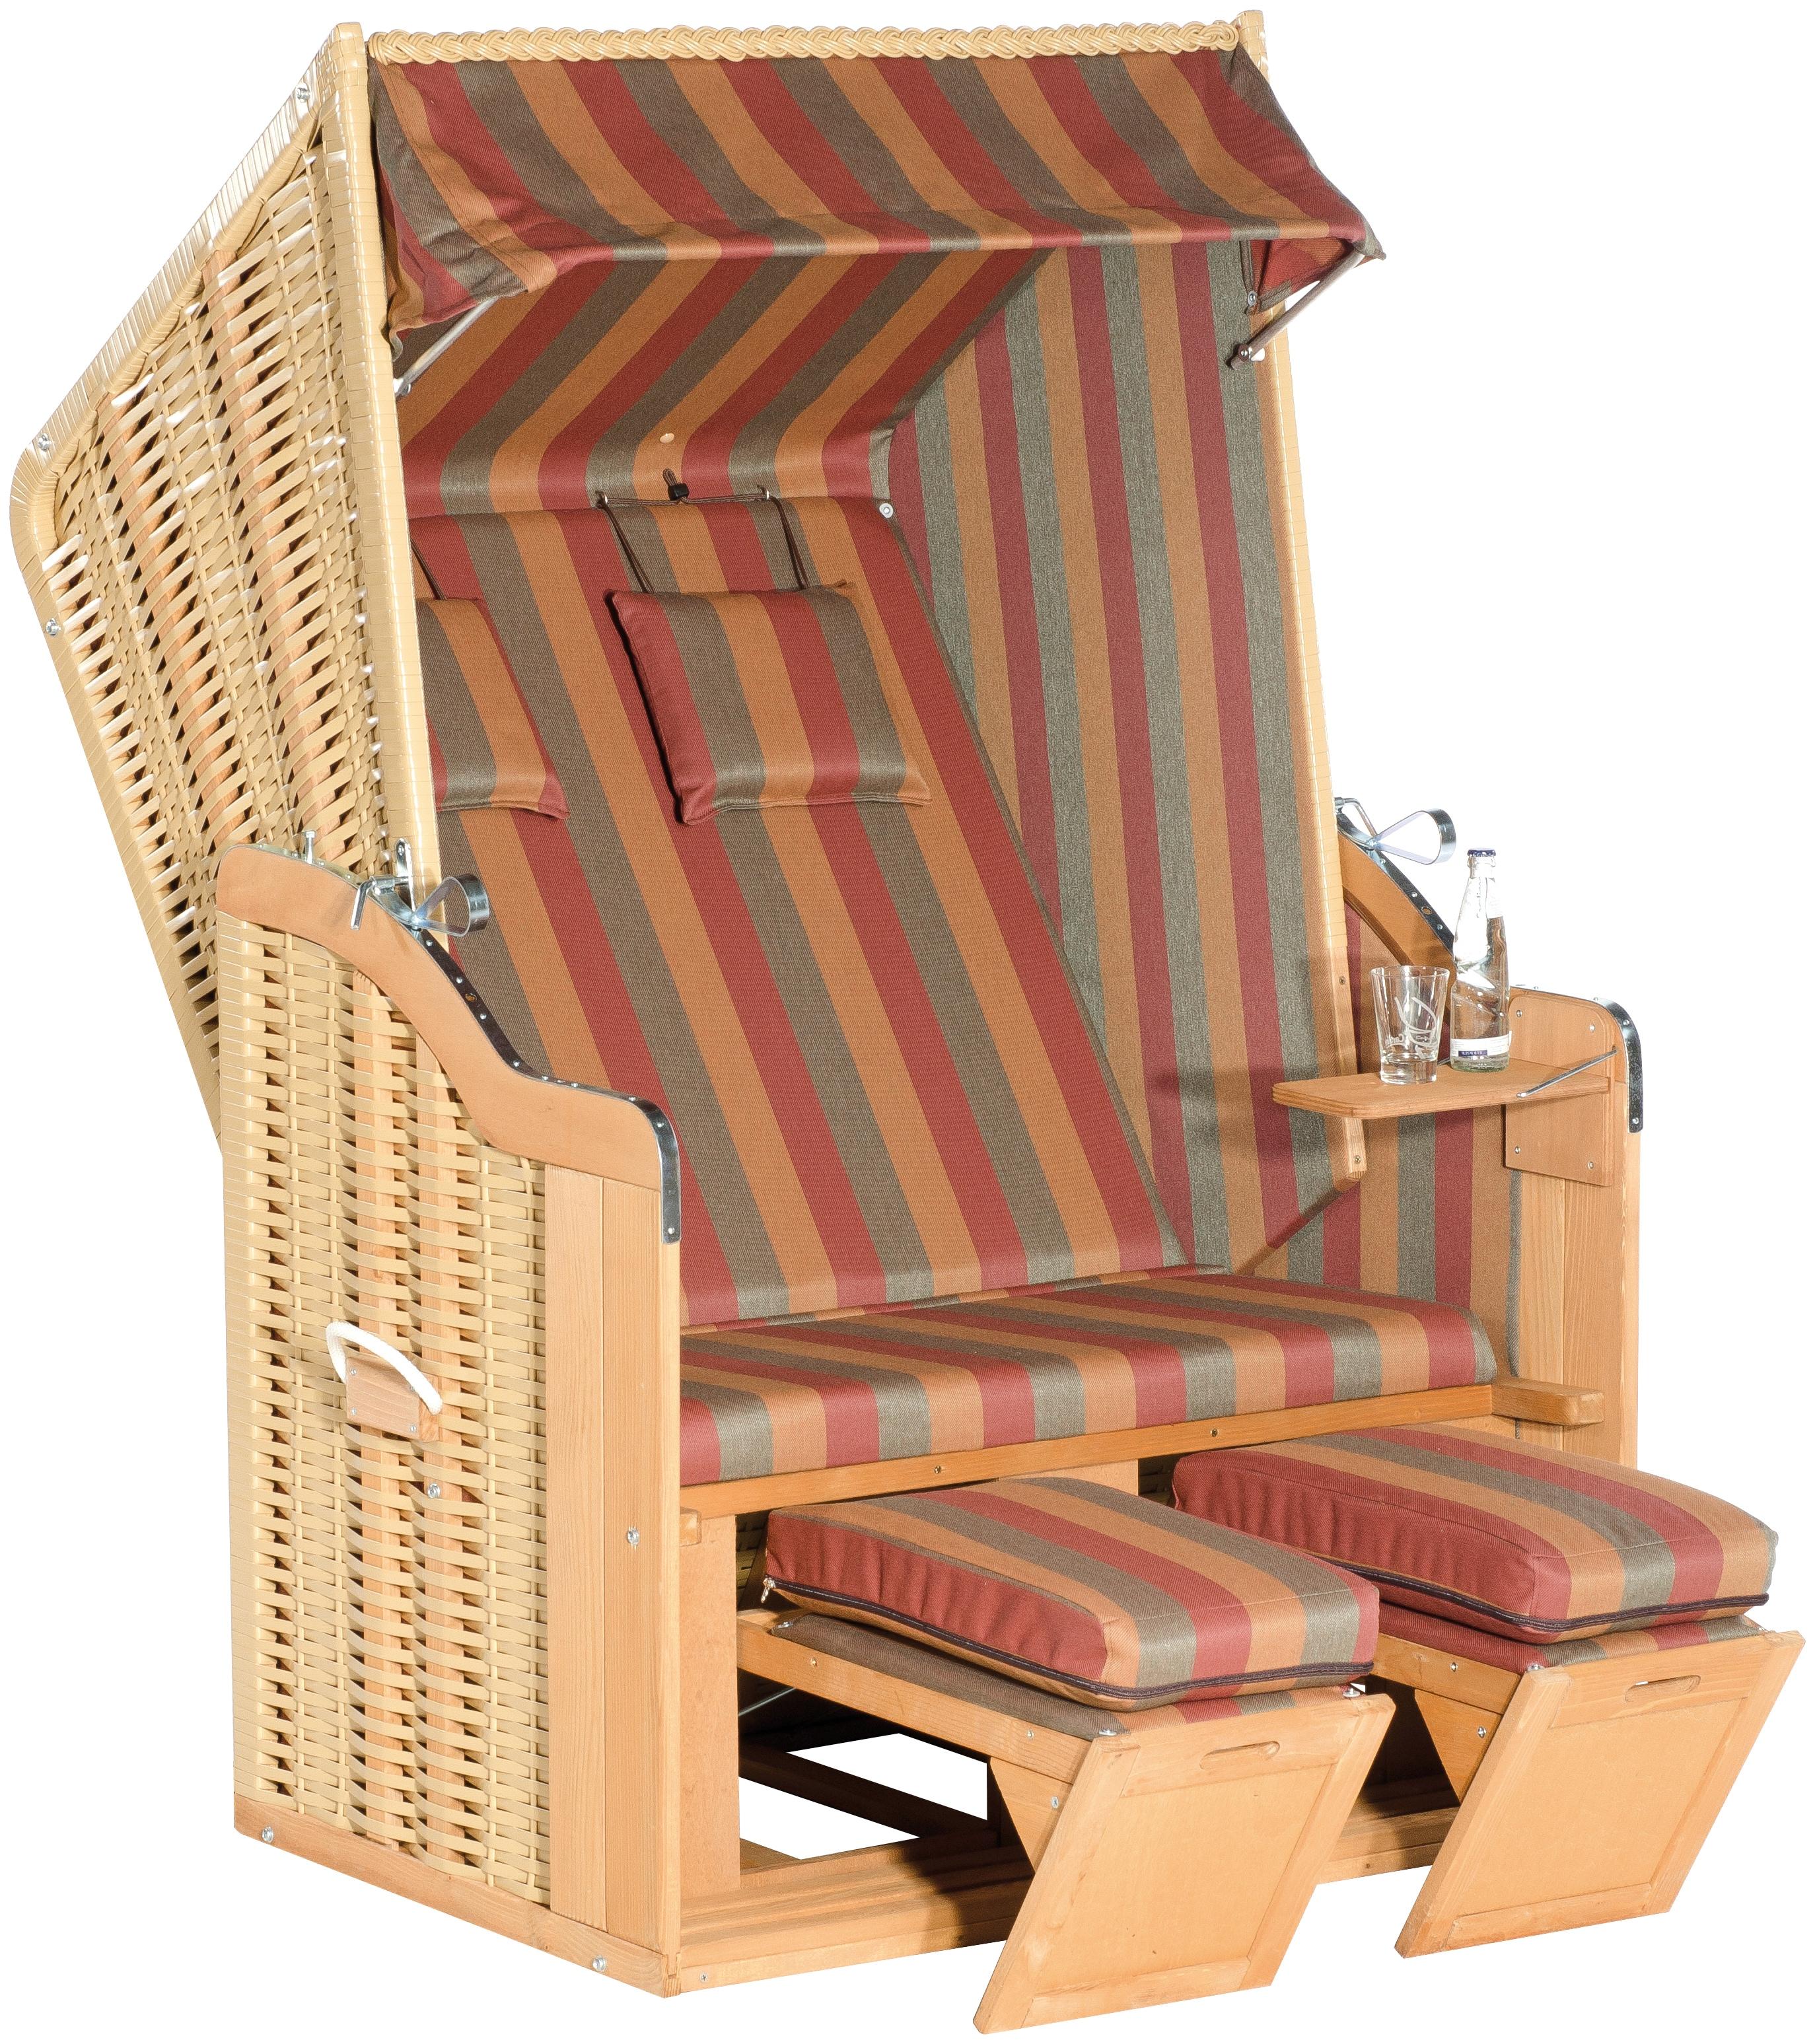 SunnySmart Strandkorb Rustikal 50 Plus 1199 beige Strandkörbe Garten, Terrasse Balkon